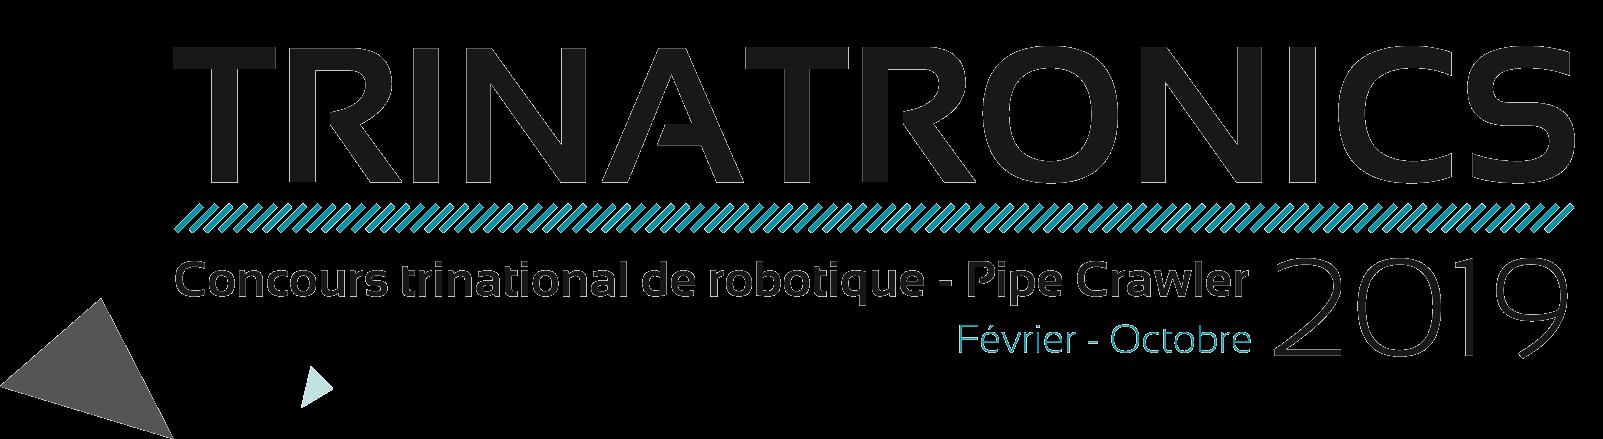 Trinatronics-2019.png